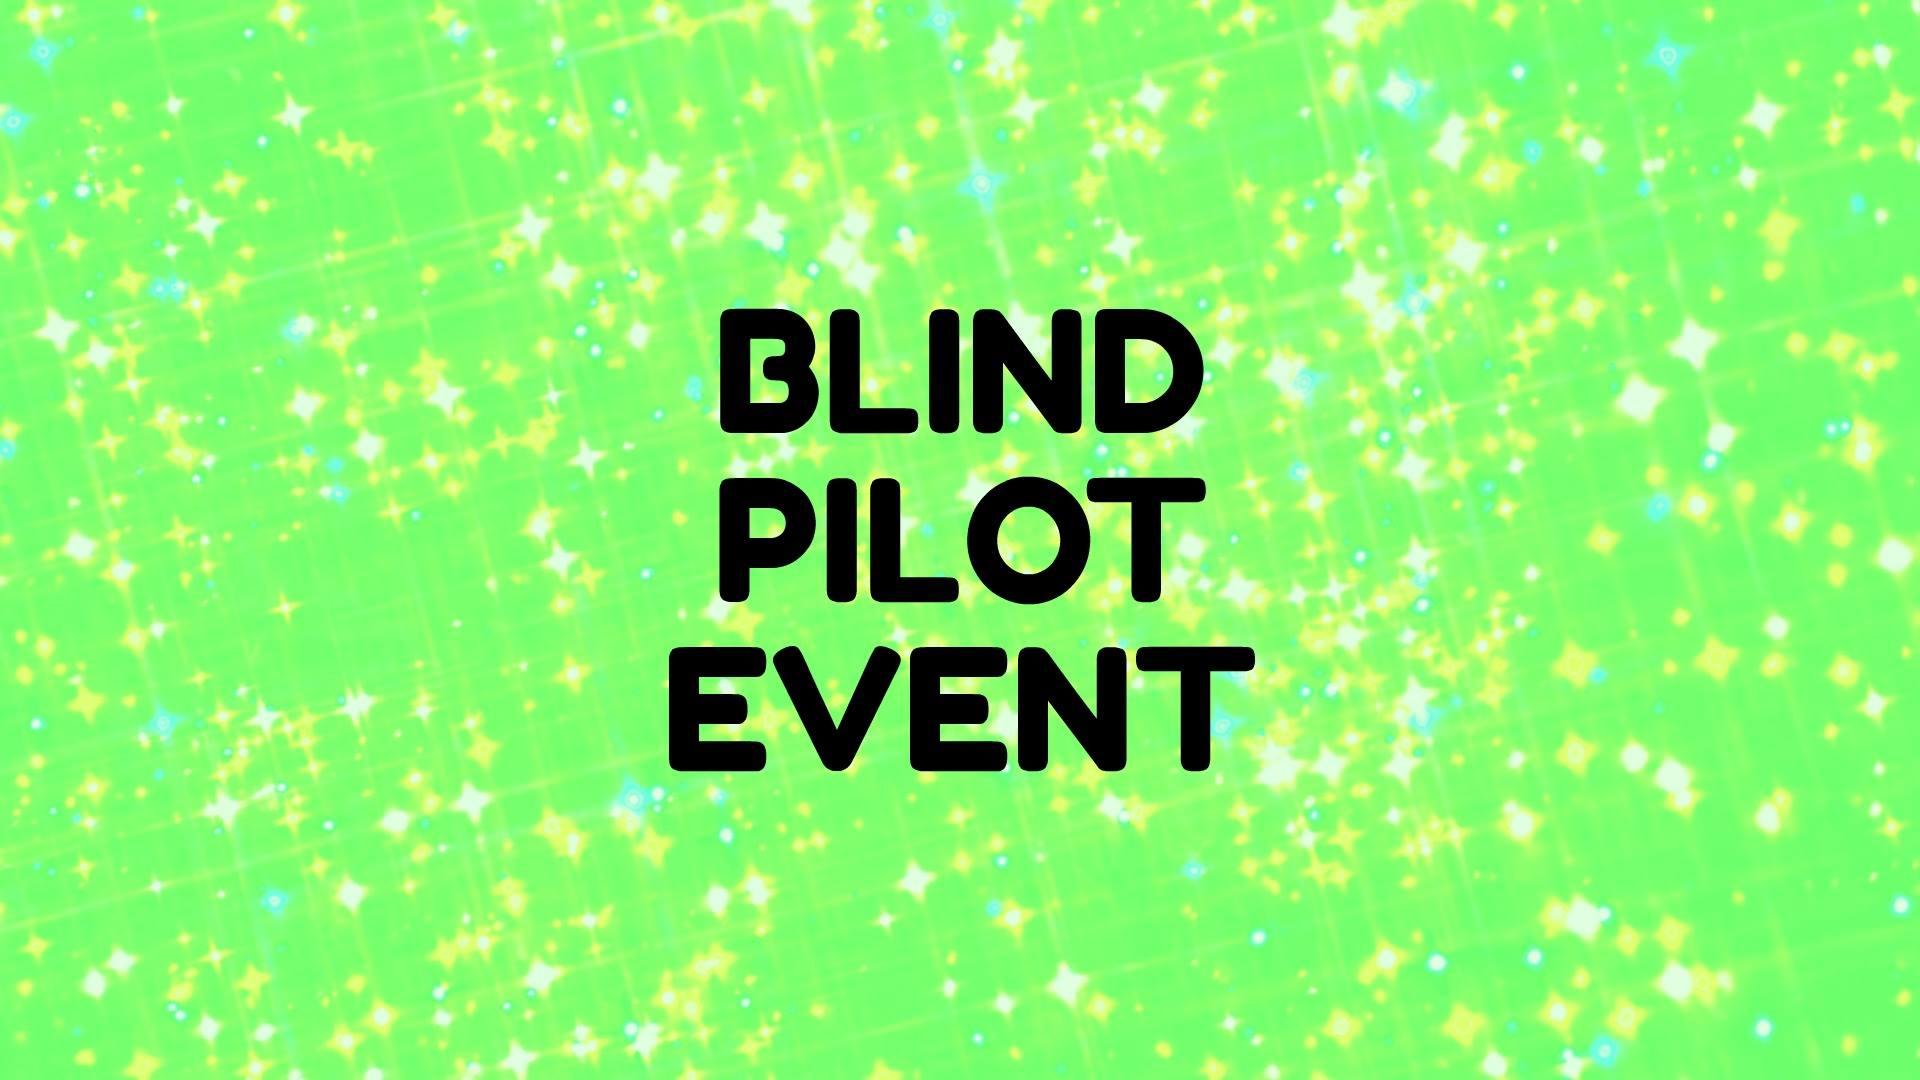 Blind-Pilot-Event.jpg